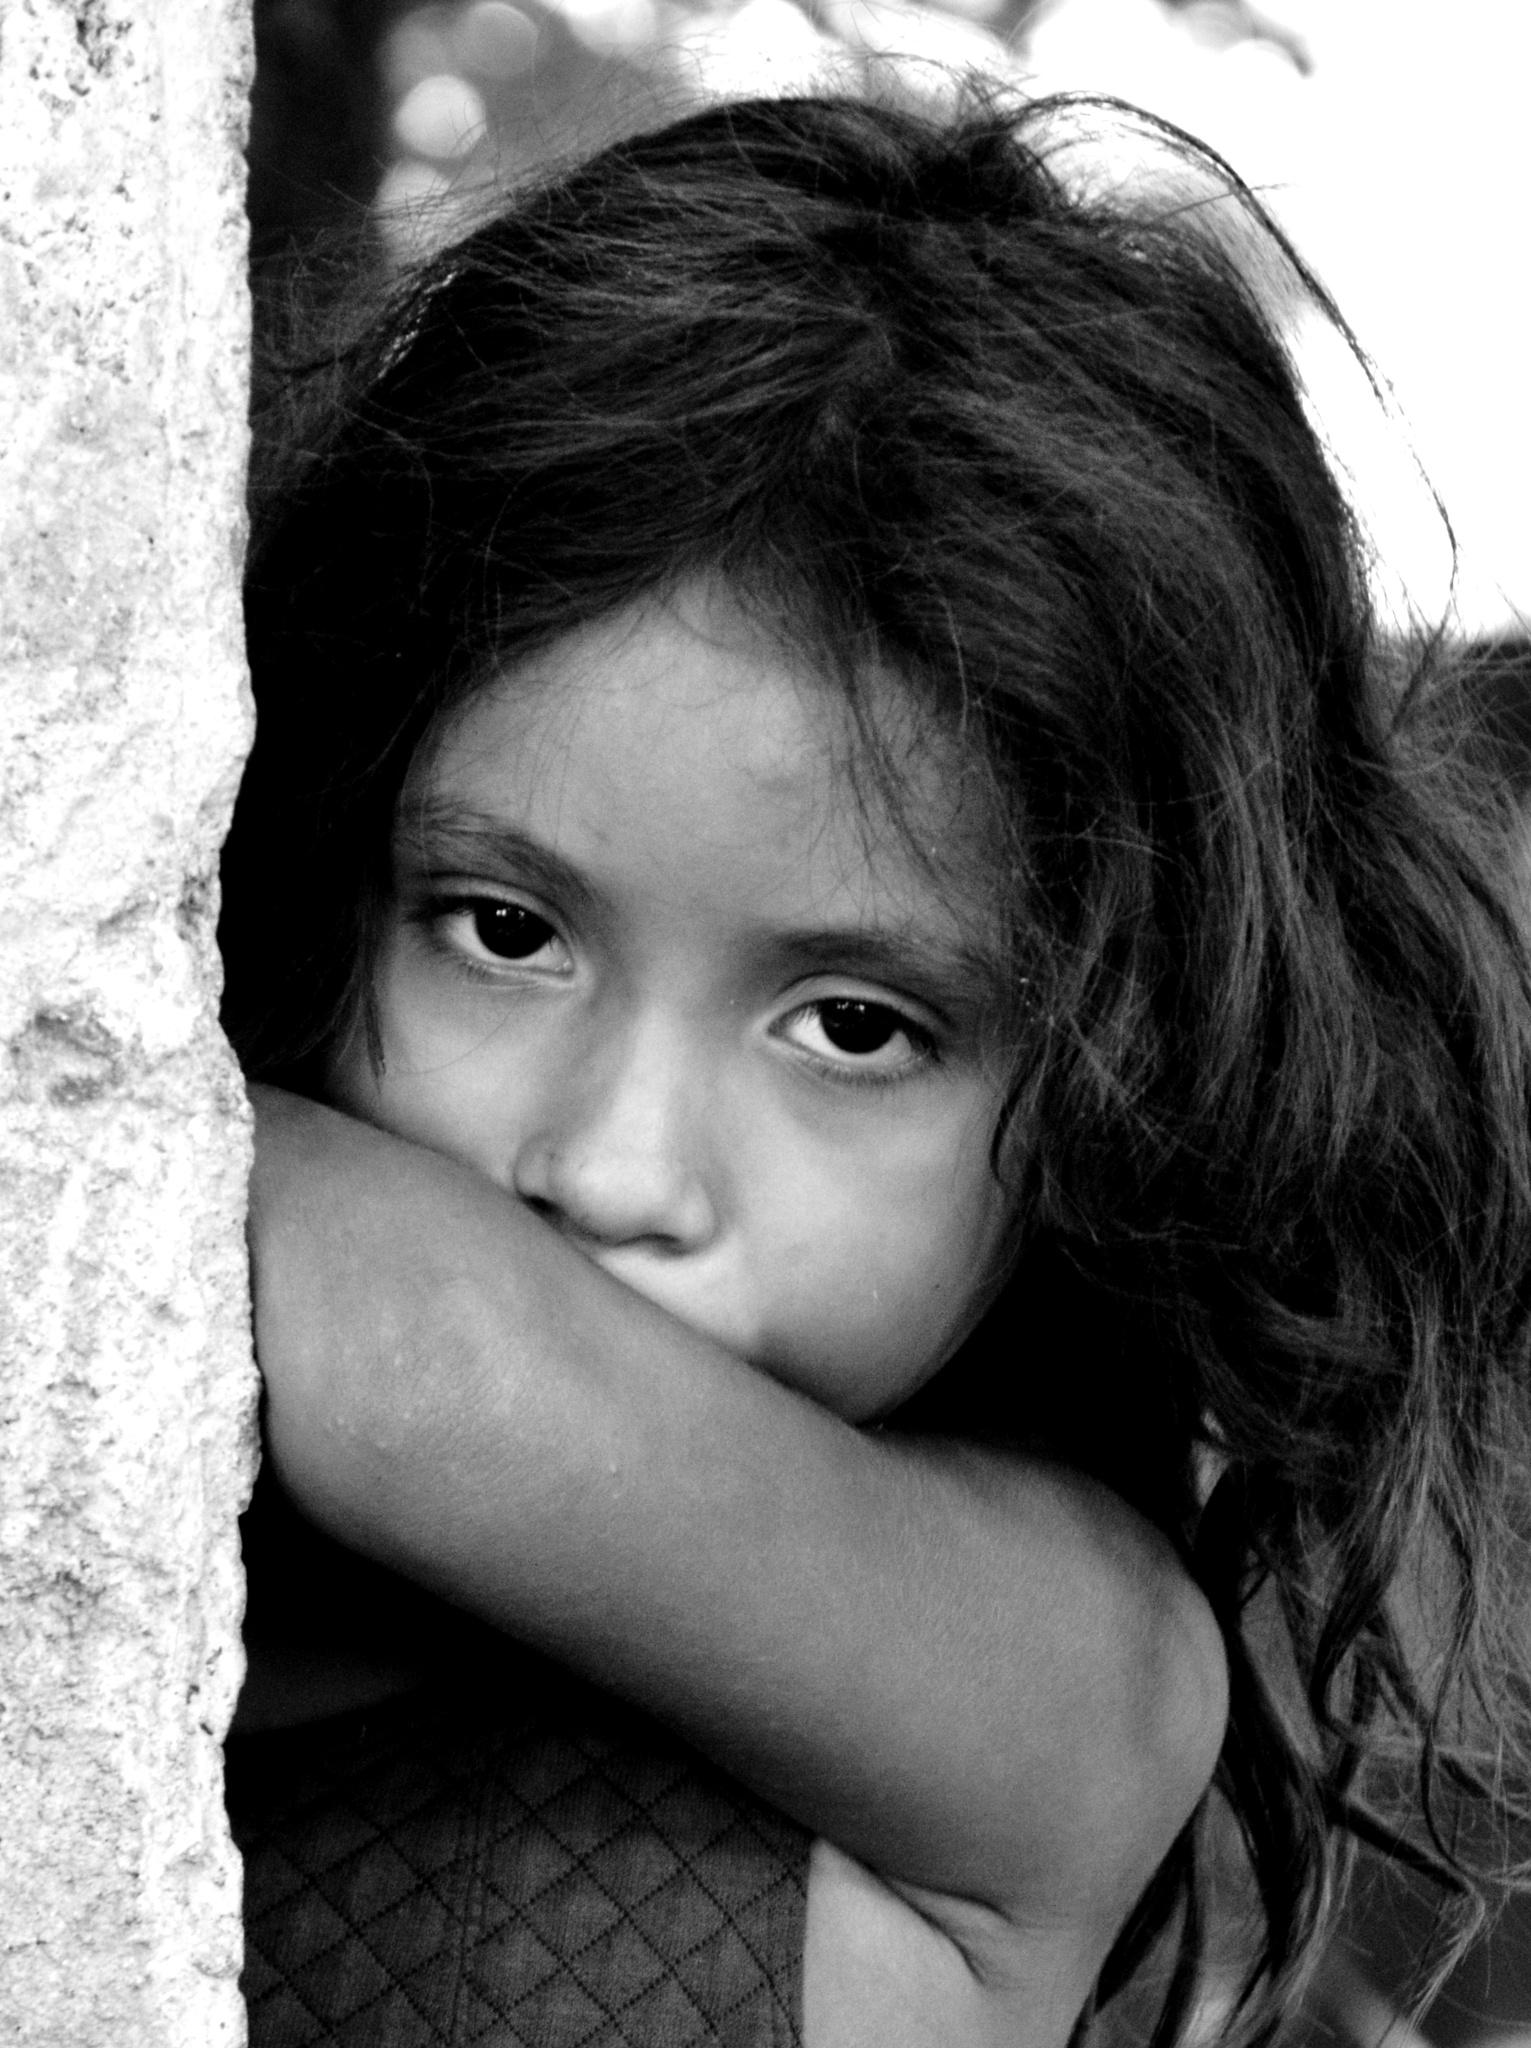 Yamara 2 by Ives Martinez